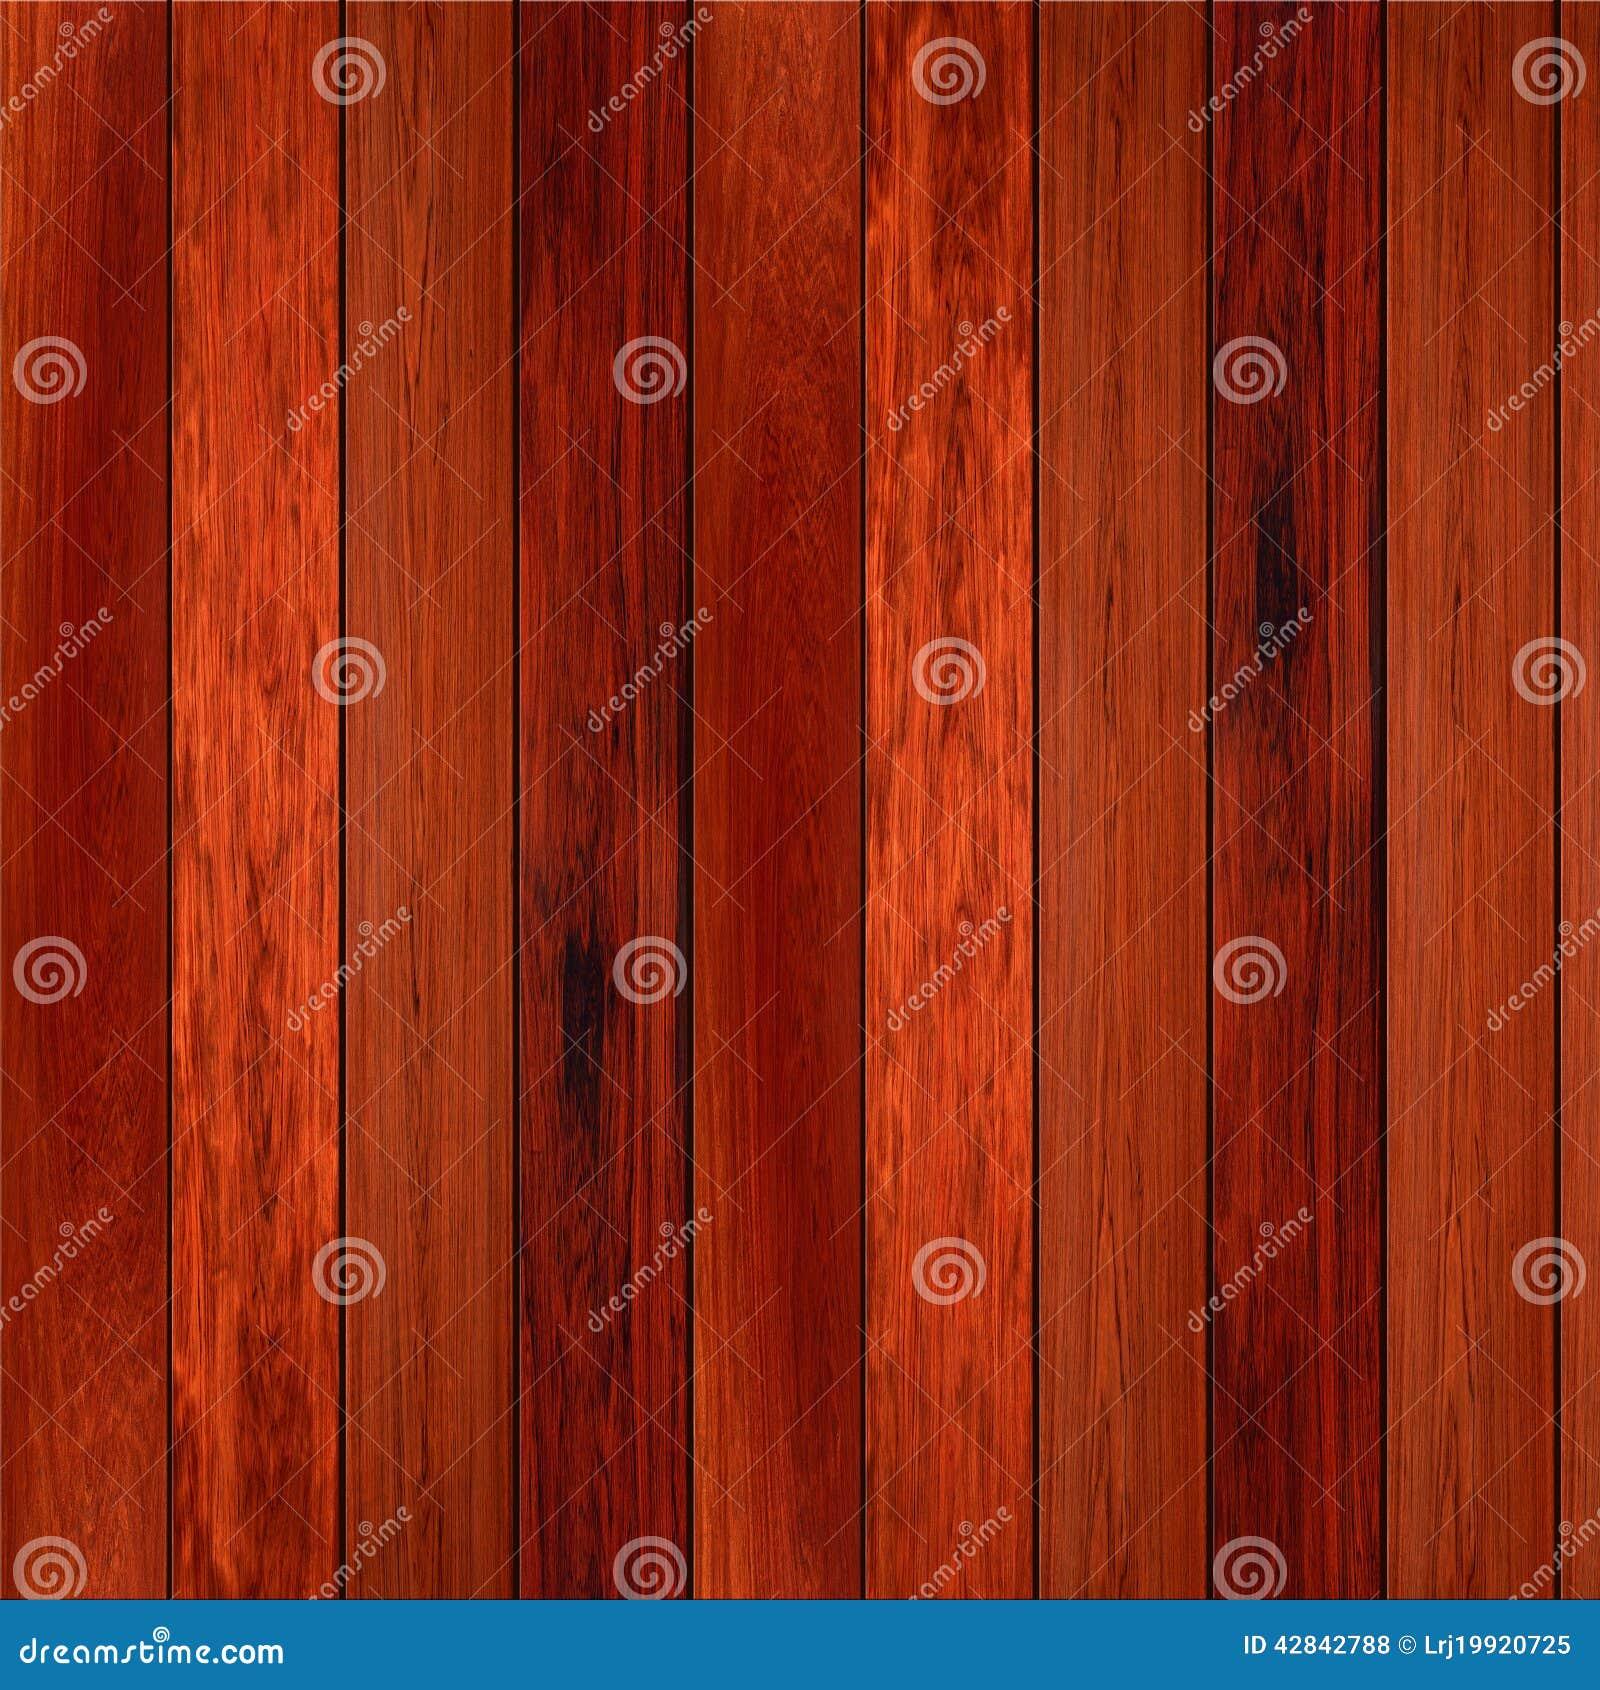 Birch wood grain details royalty free stock photo